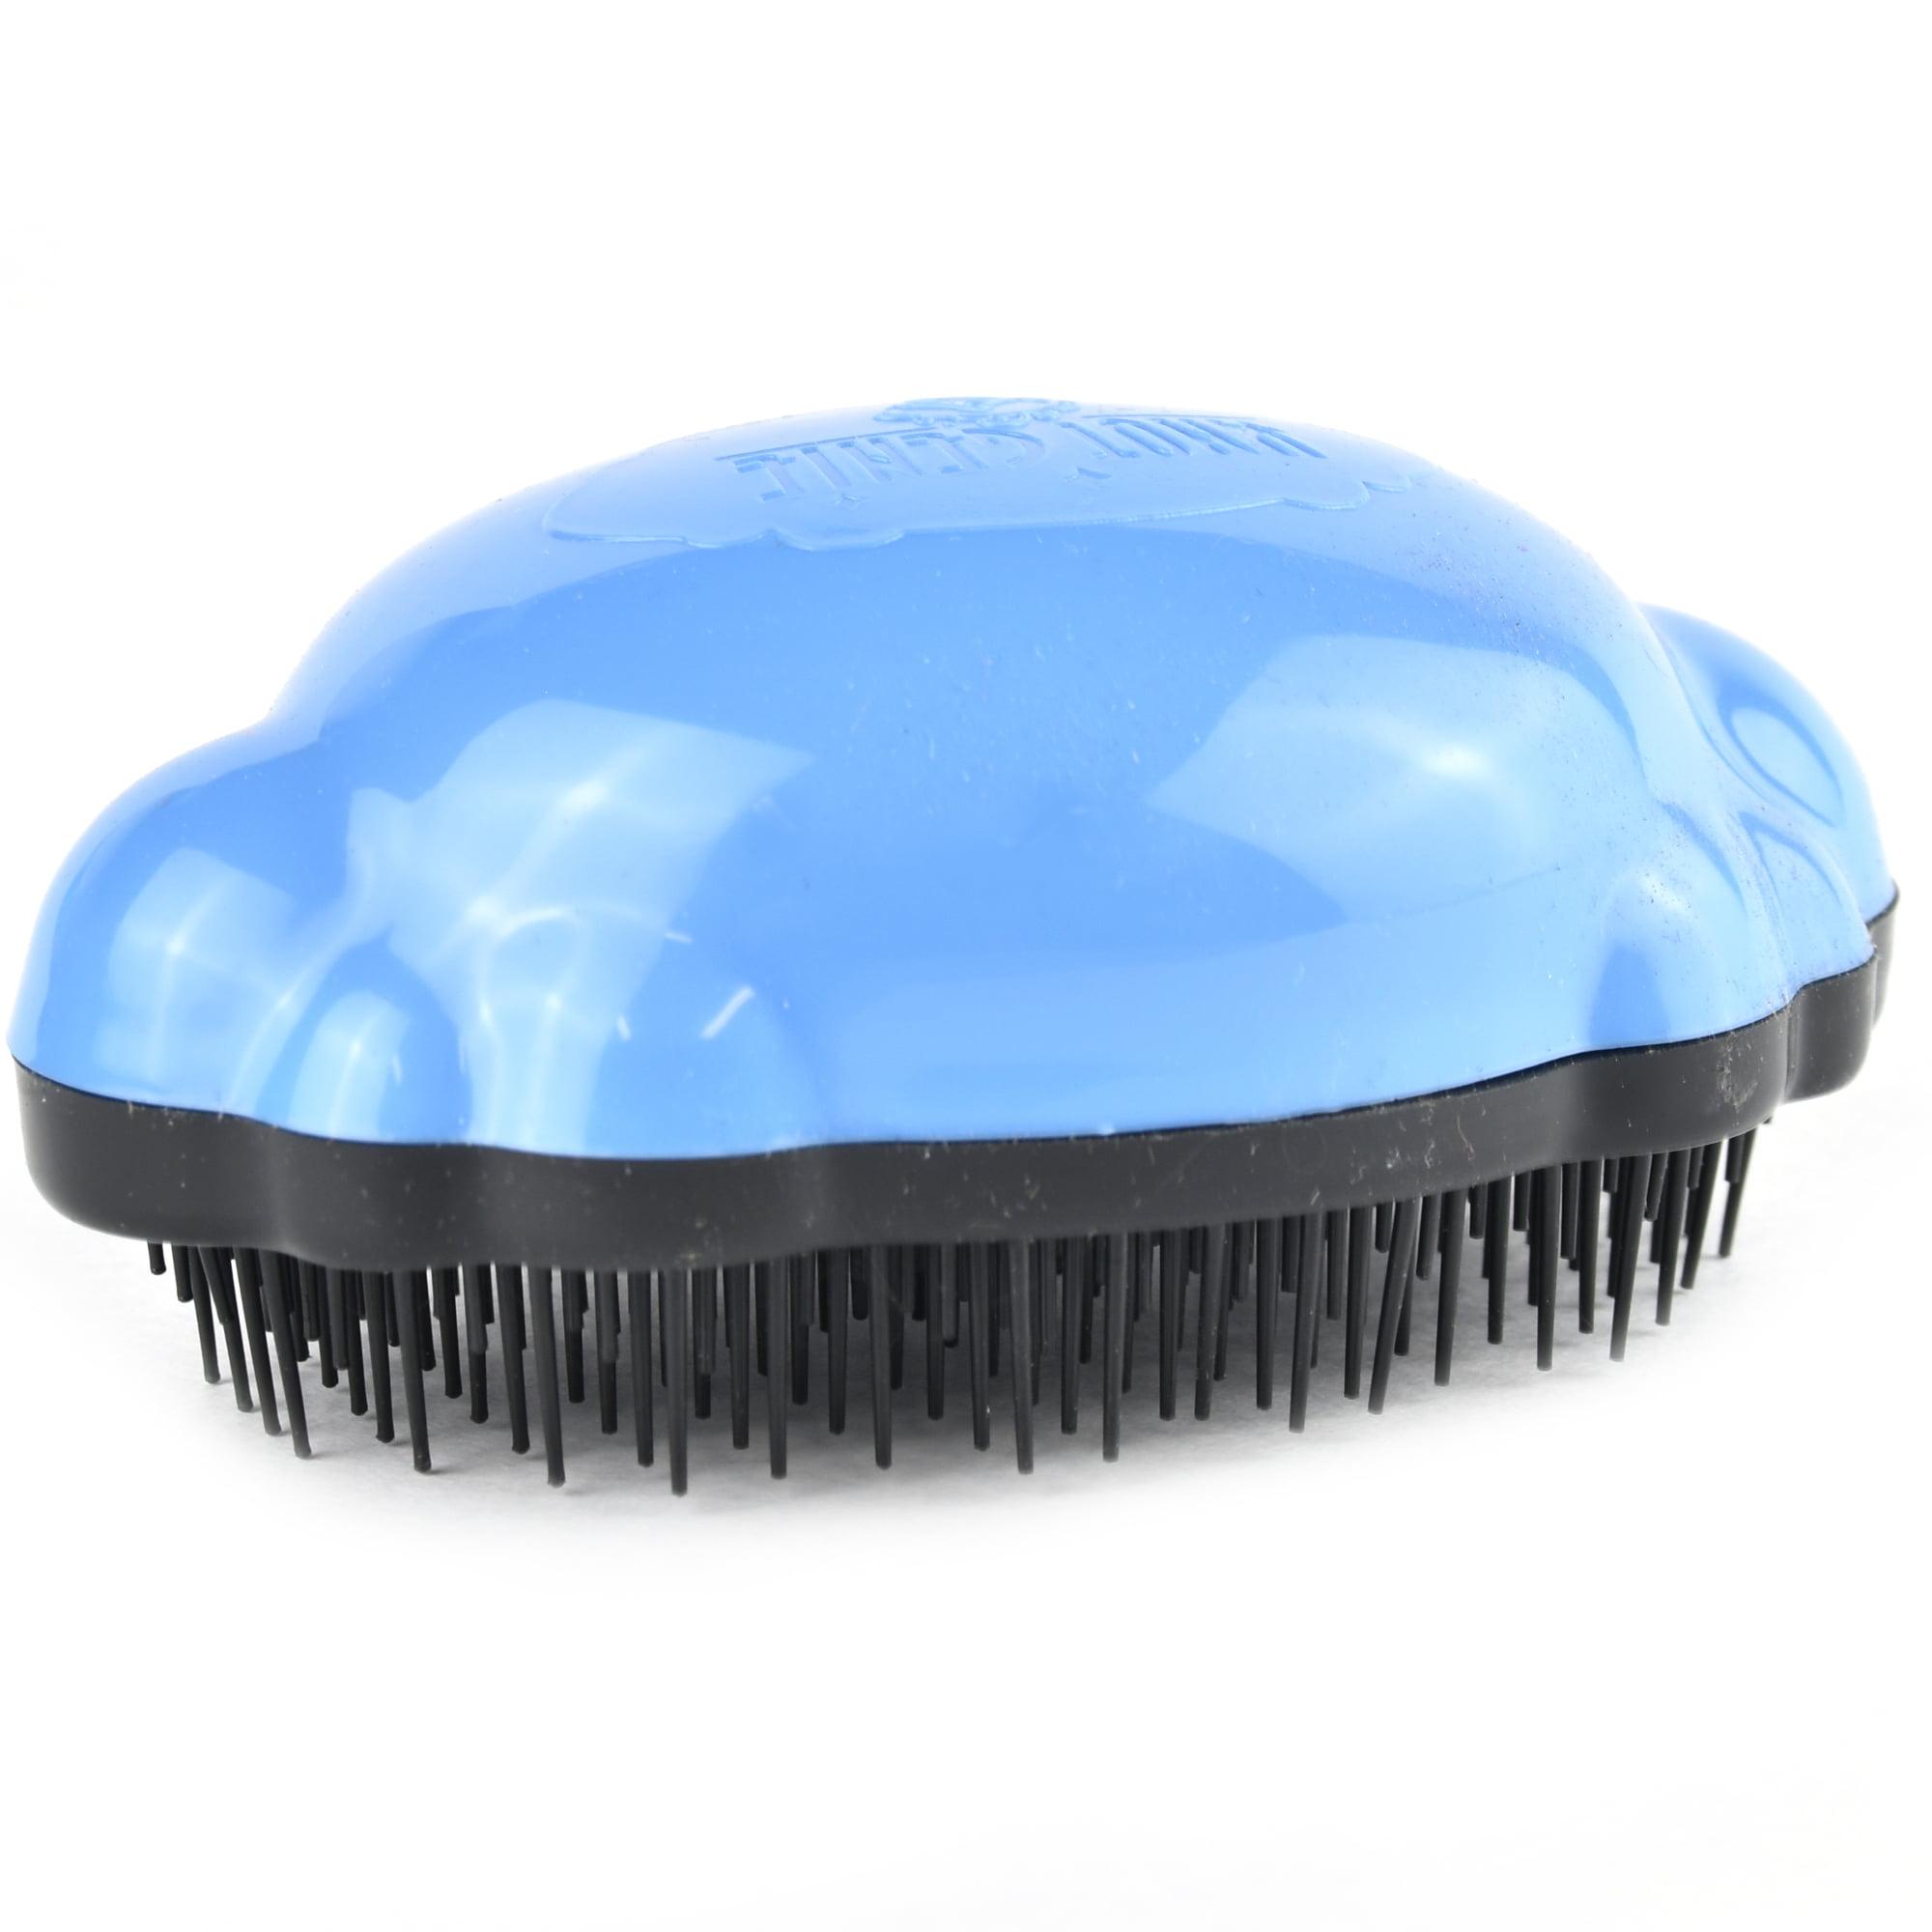 Knot Genie - Teeny Detangling Wet/Dry Hairbrush - Mystical Cloud